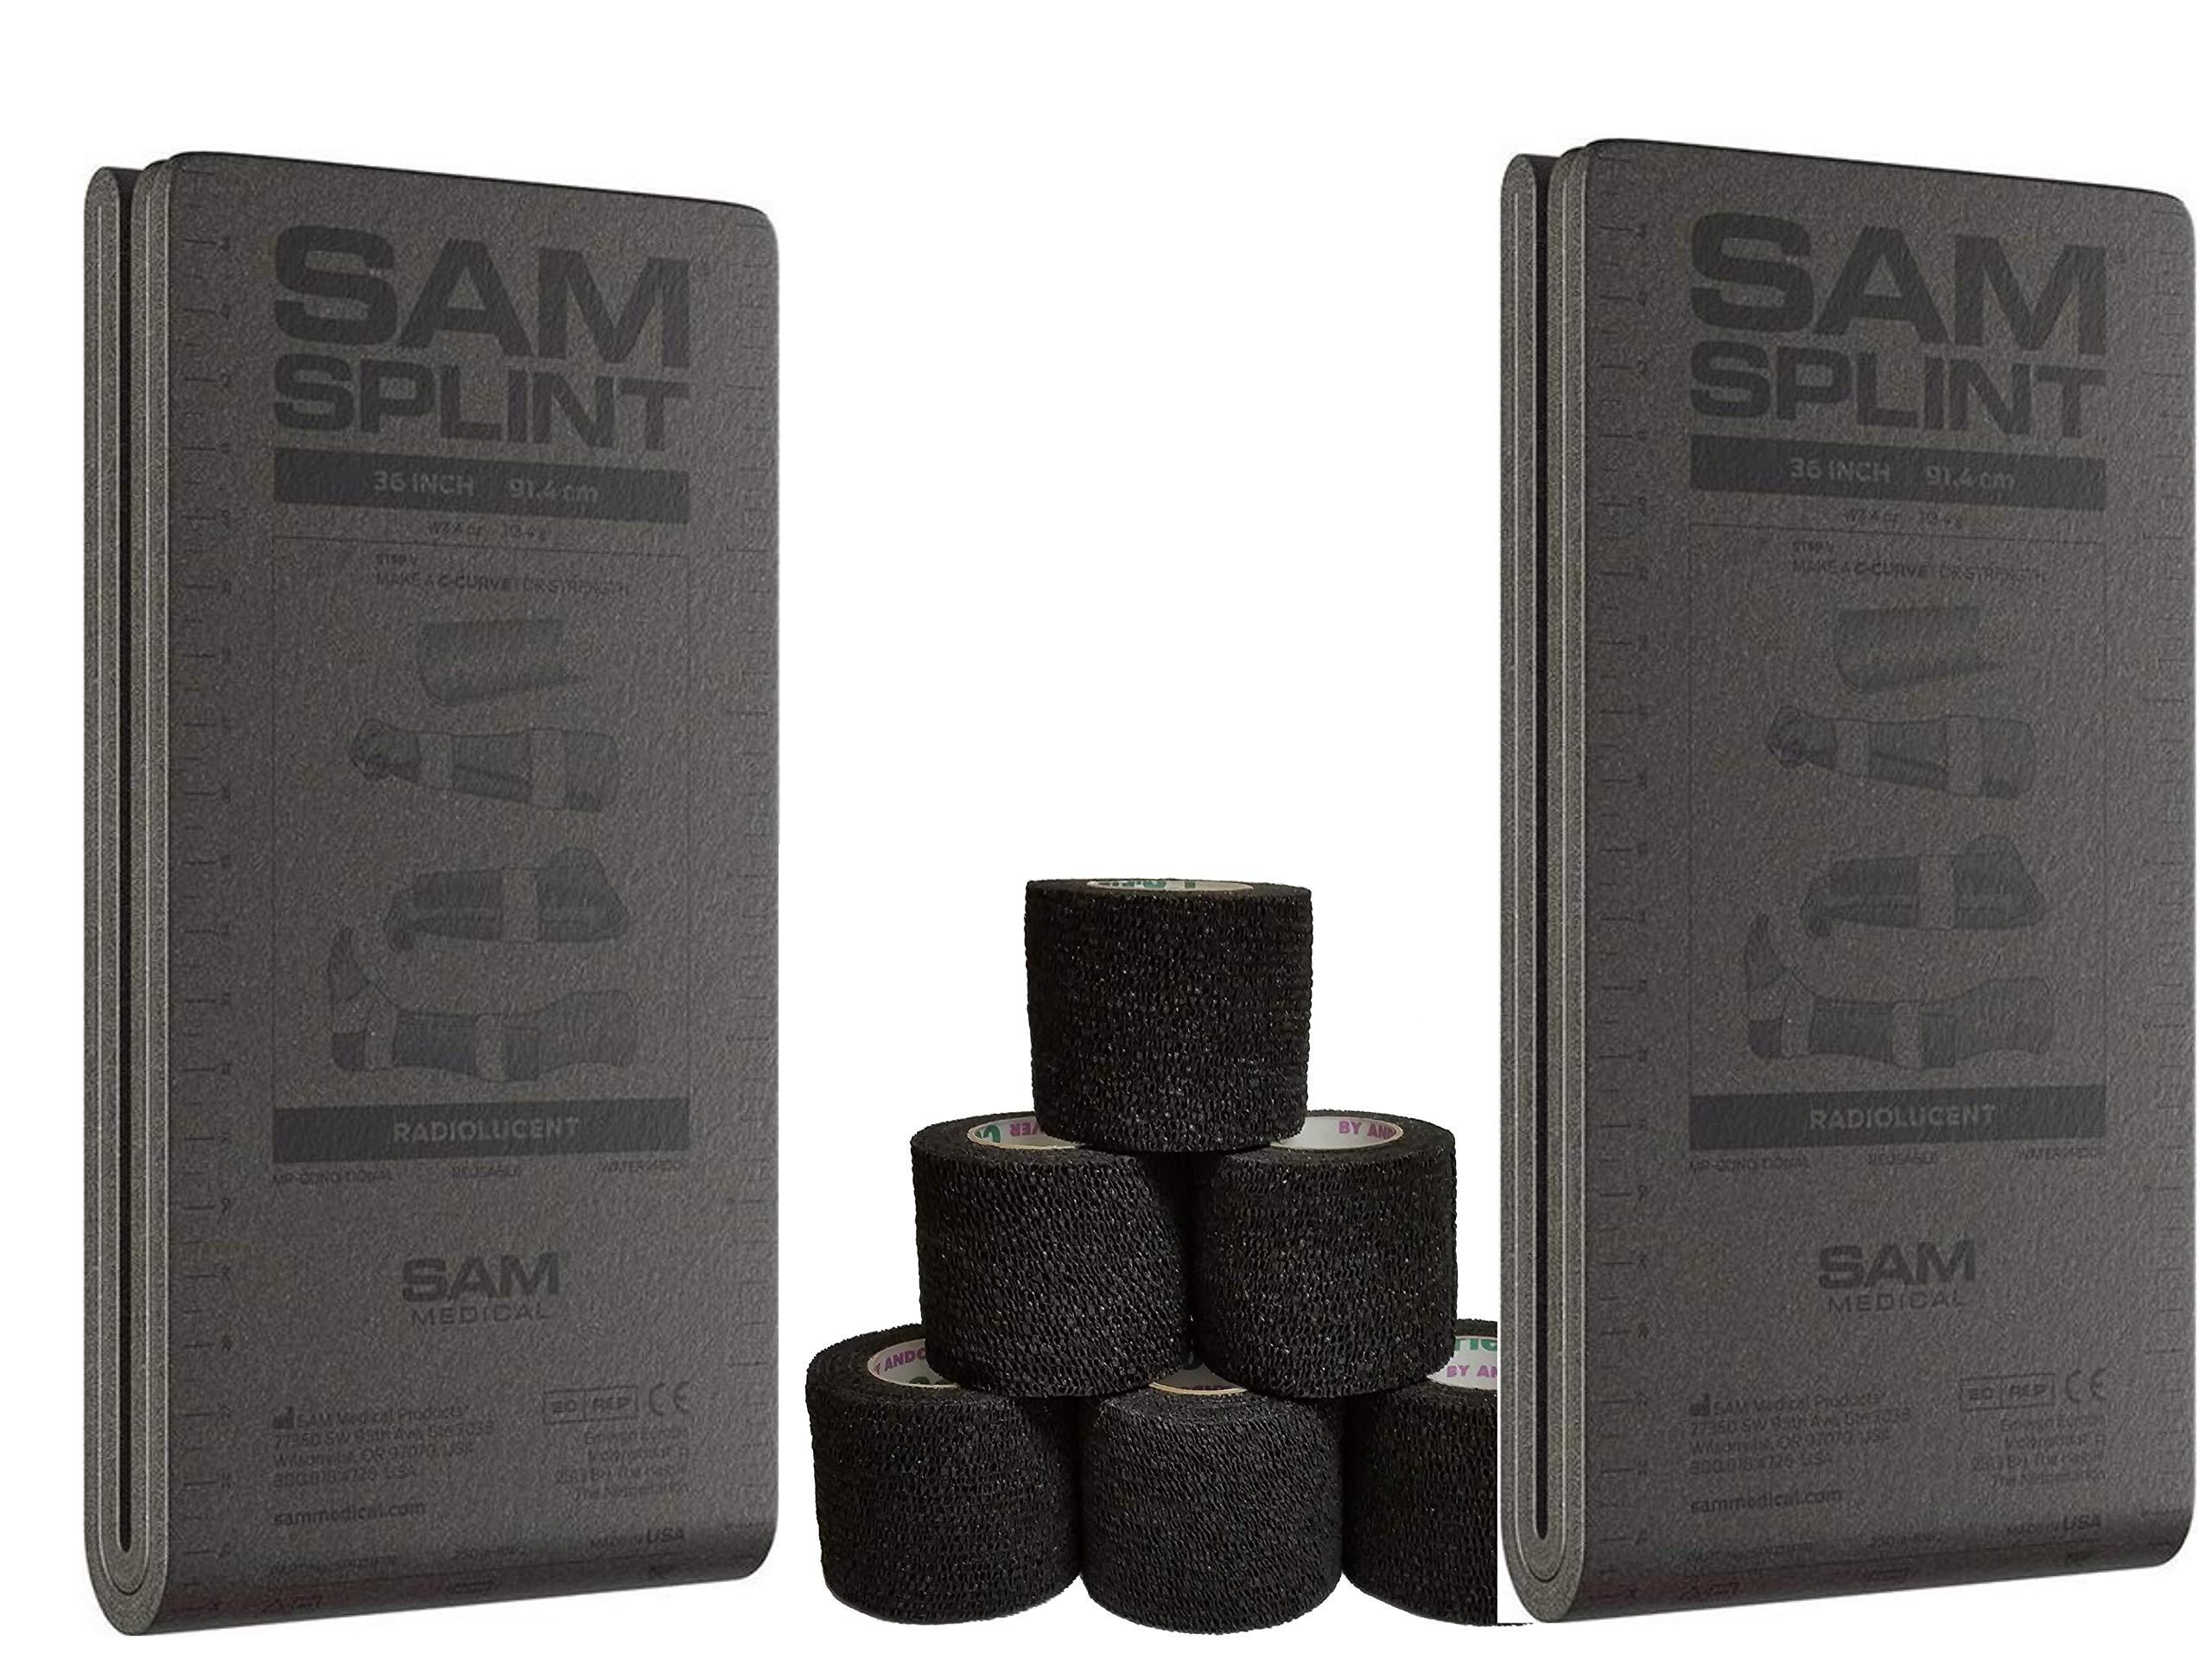 36'' SAM Splint Plus 2'' Cohesive Co-Flex Wrap Combo Kit (2 Gray Splint/4 Wraps, Black Wrap)